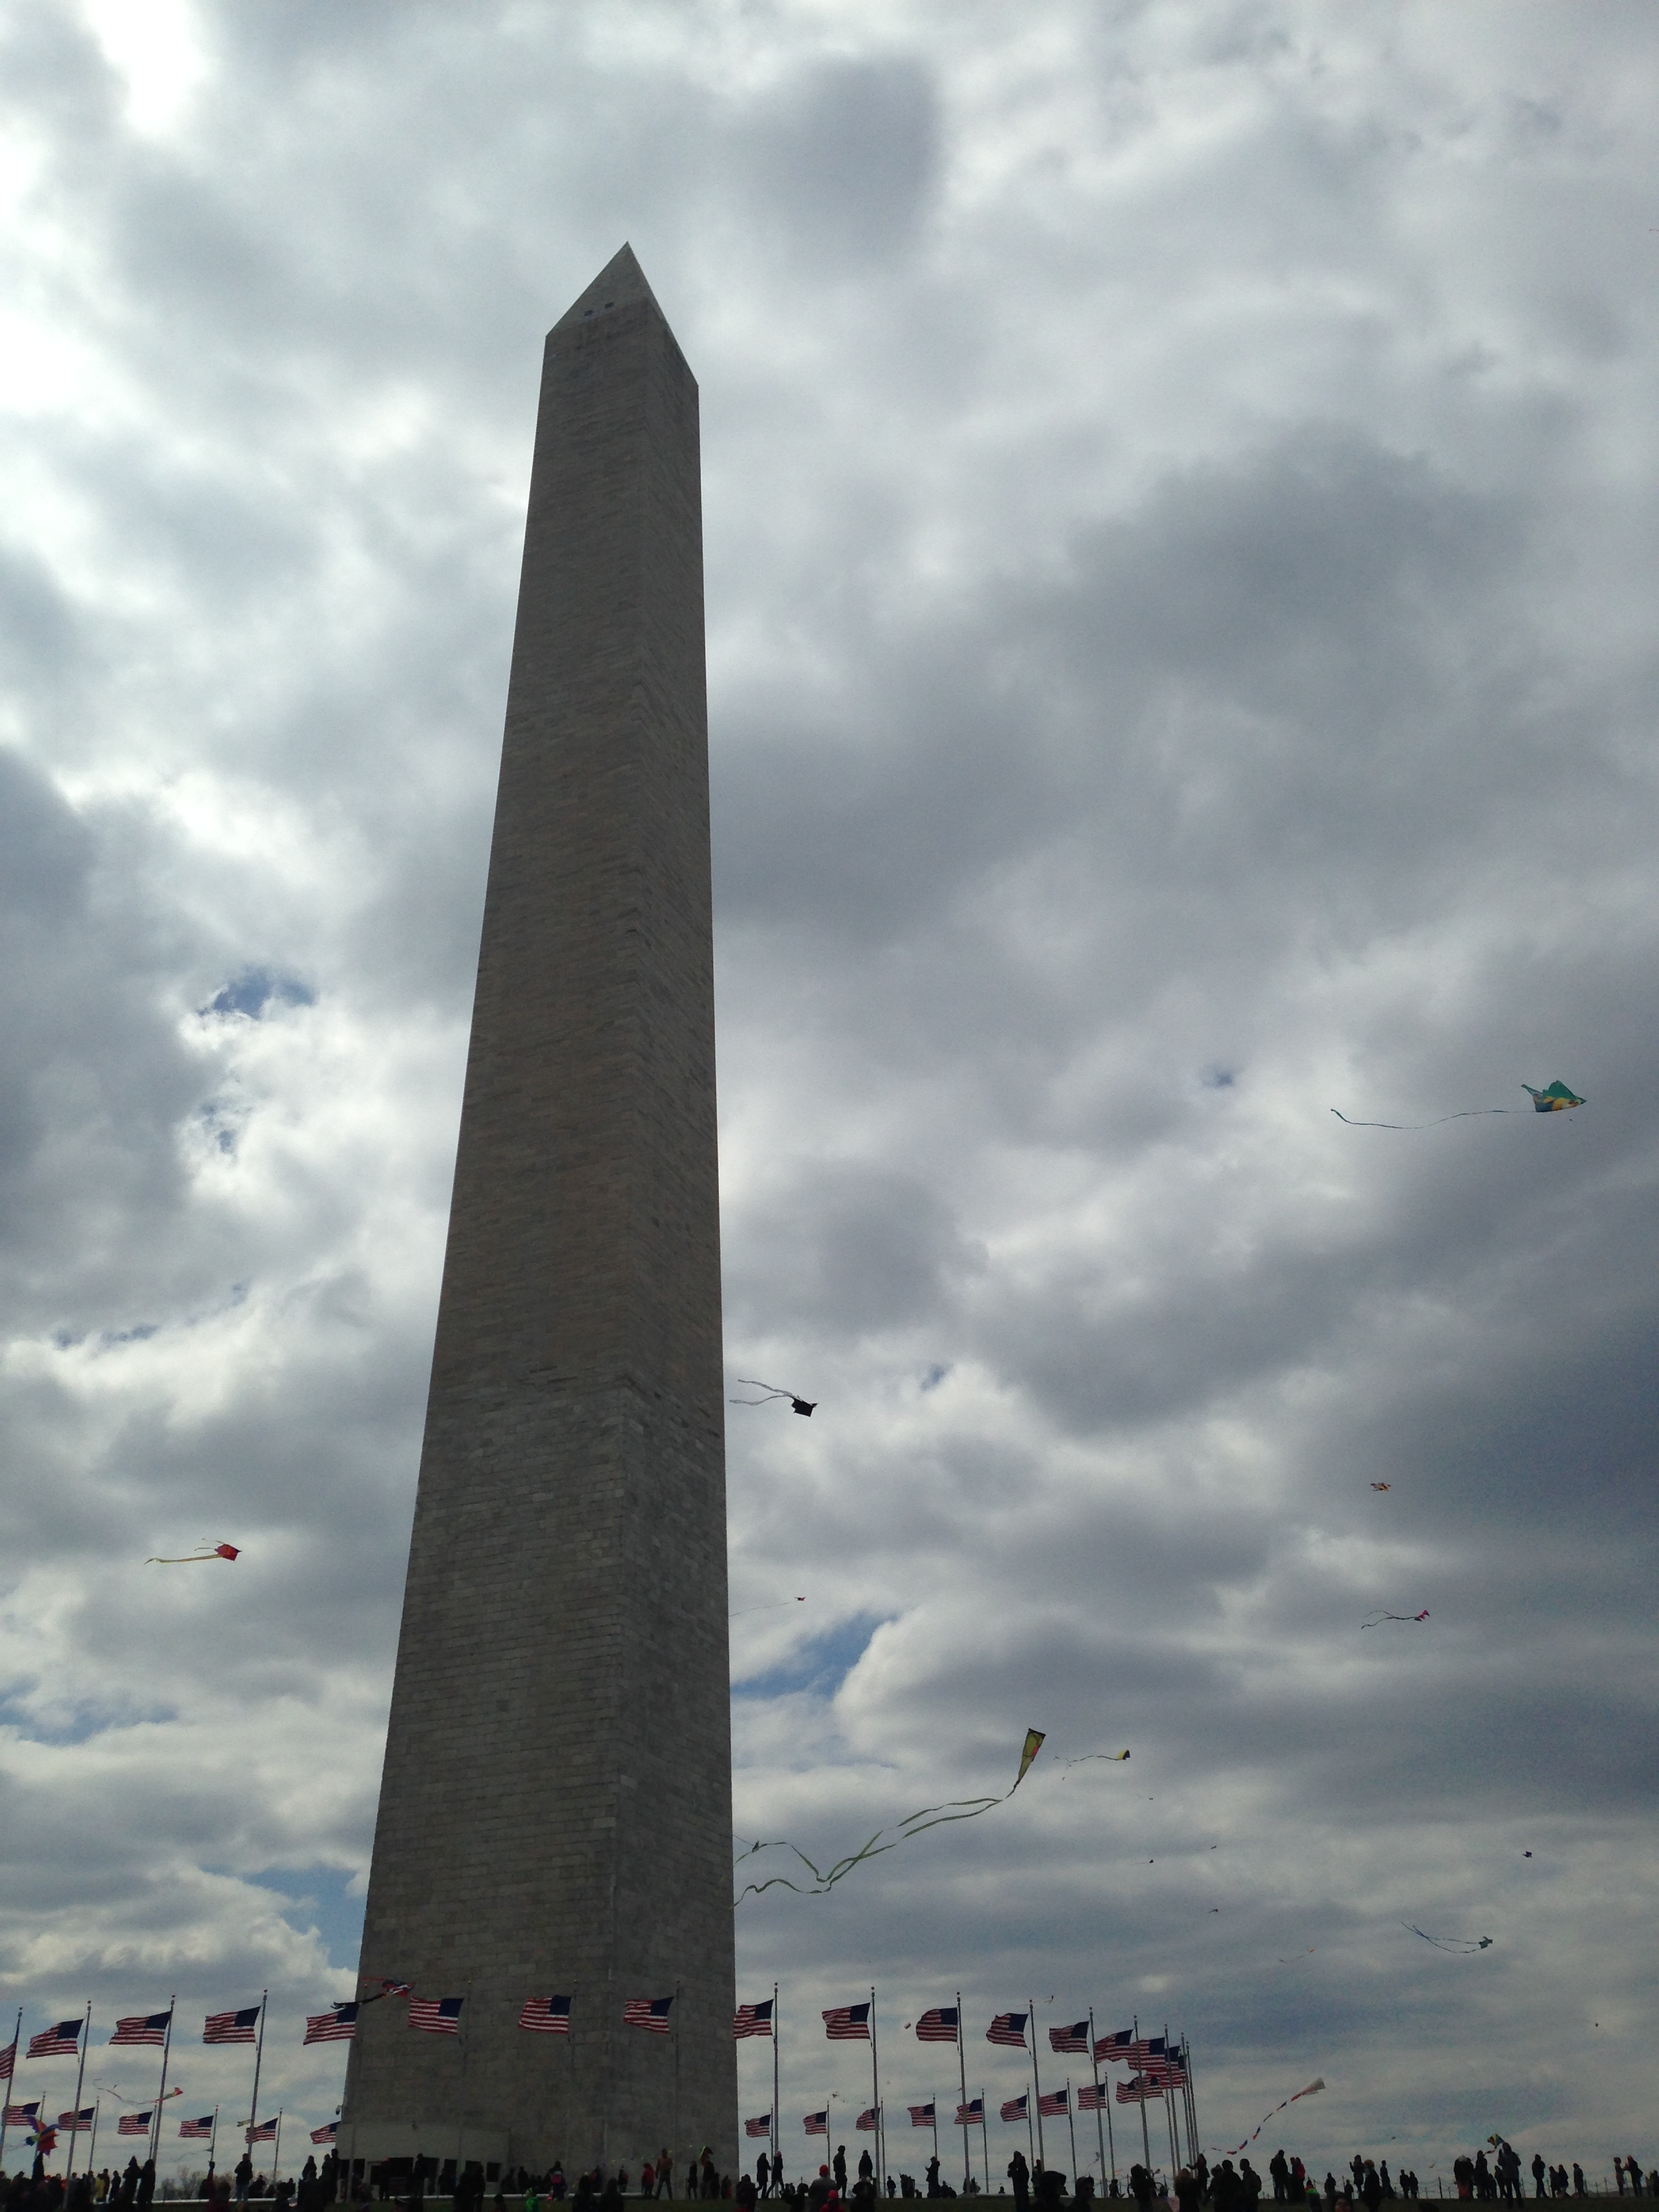 Swarming the Washington Monument